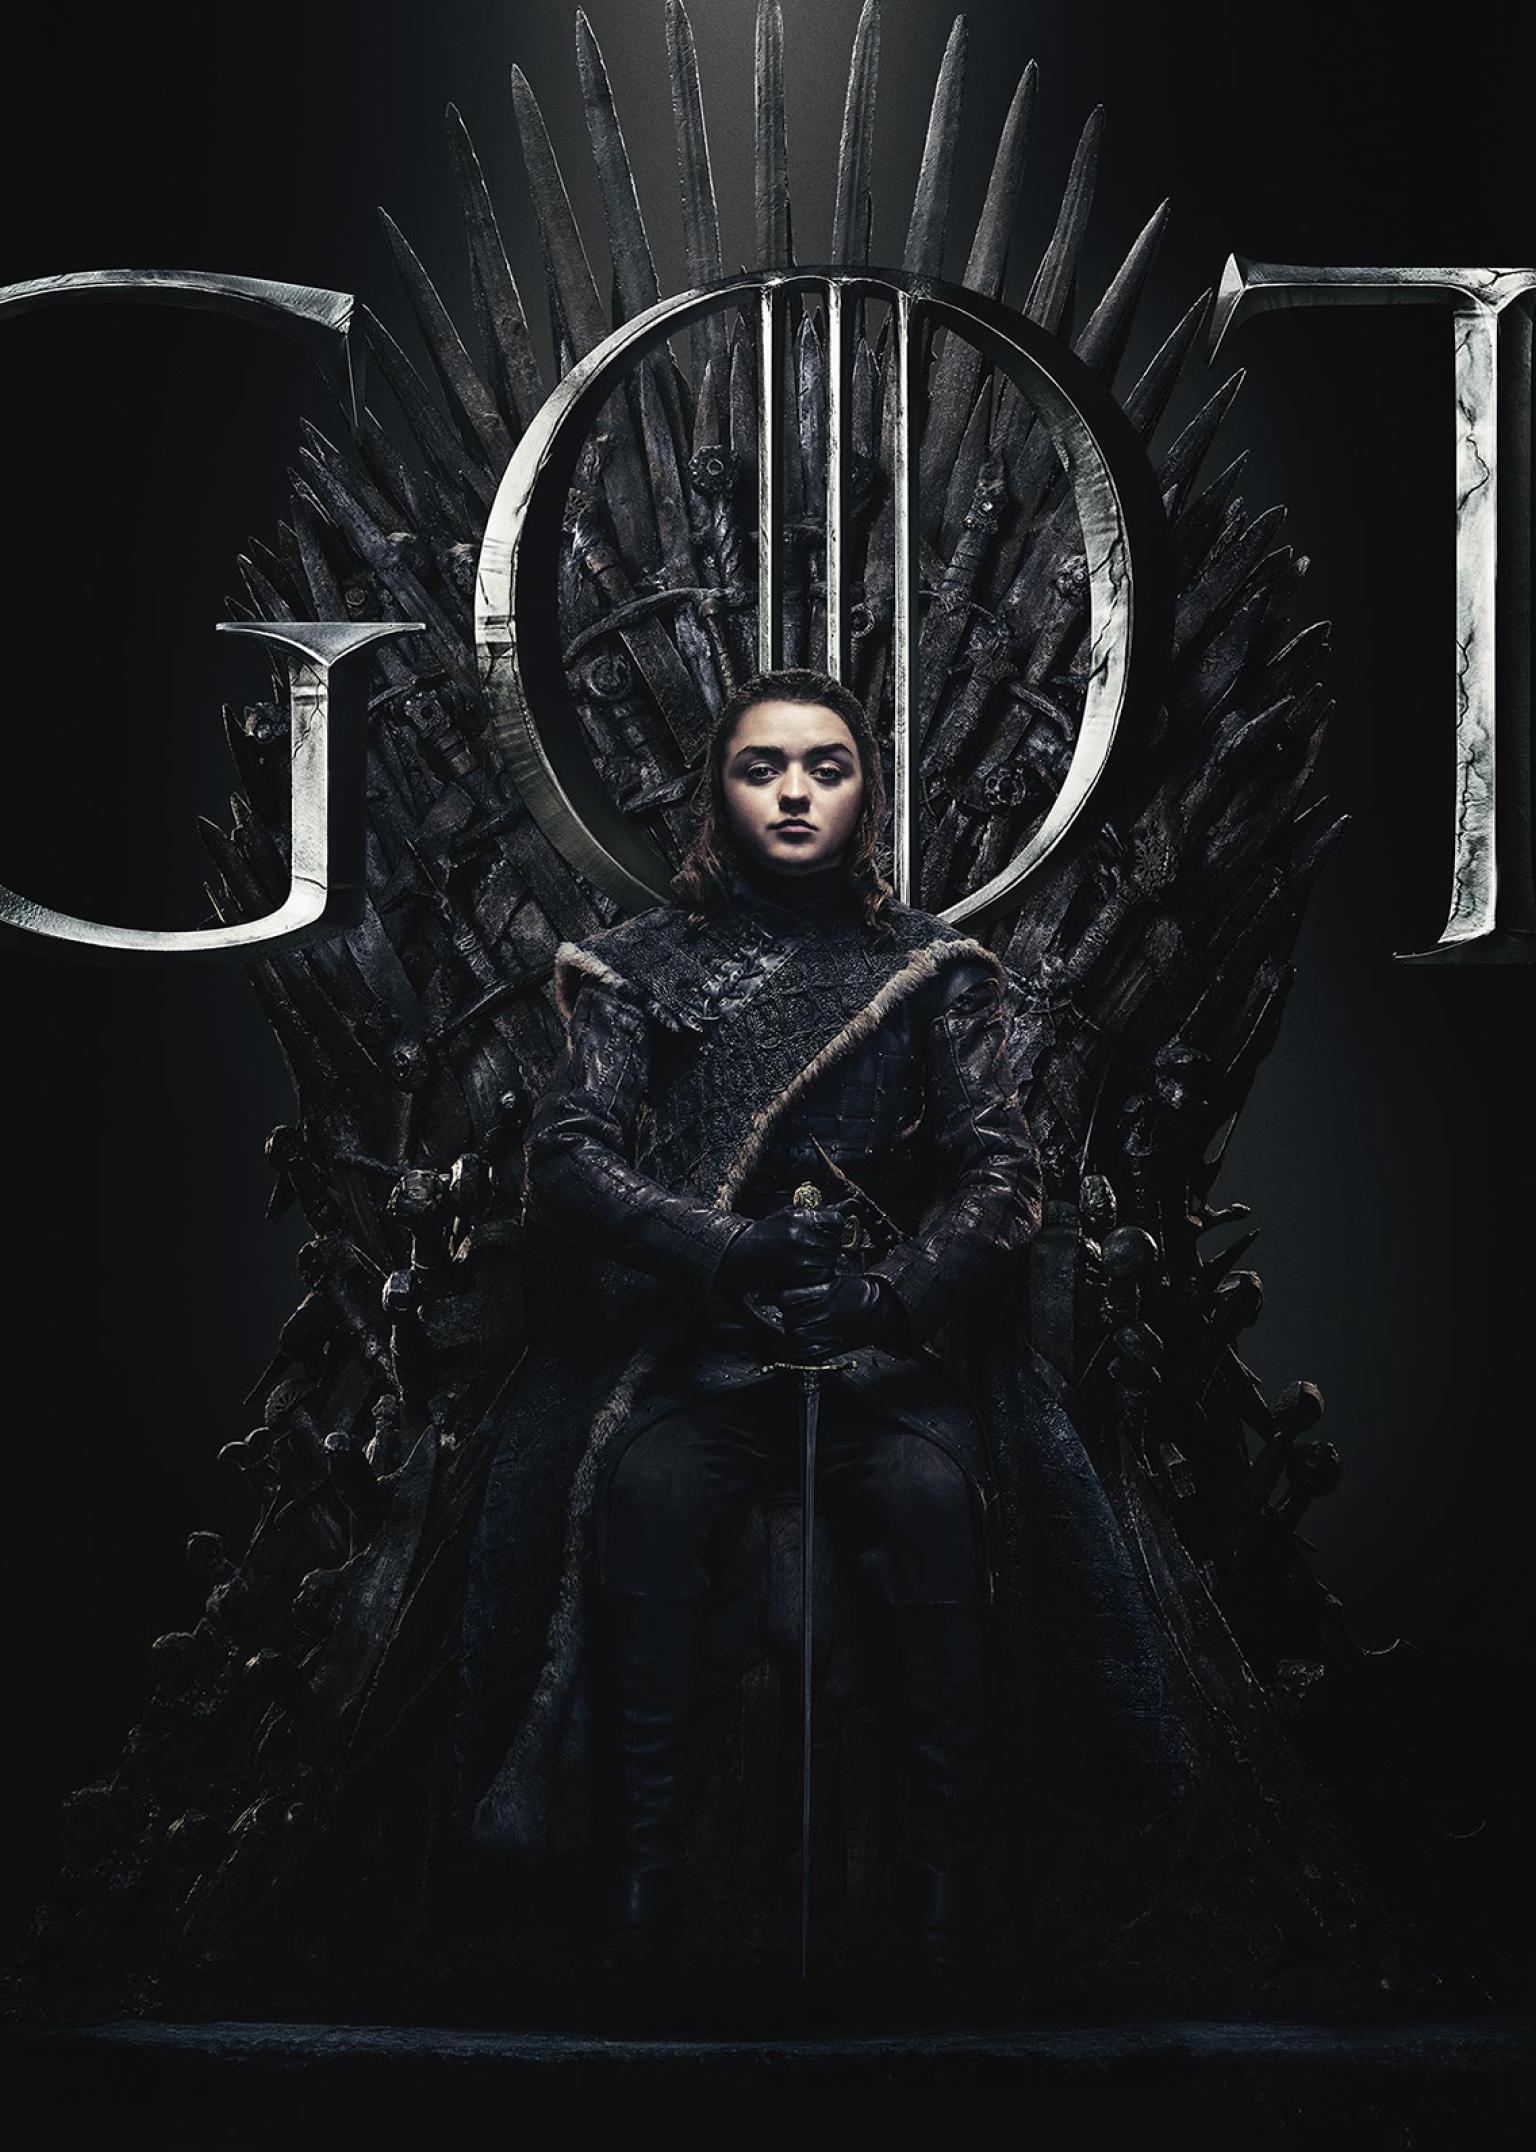 1536x2152 Arya Stark Game Of Thrones Season 8 Poster ...